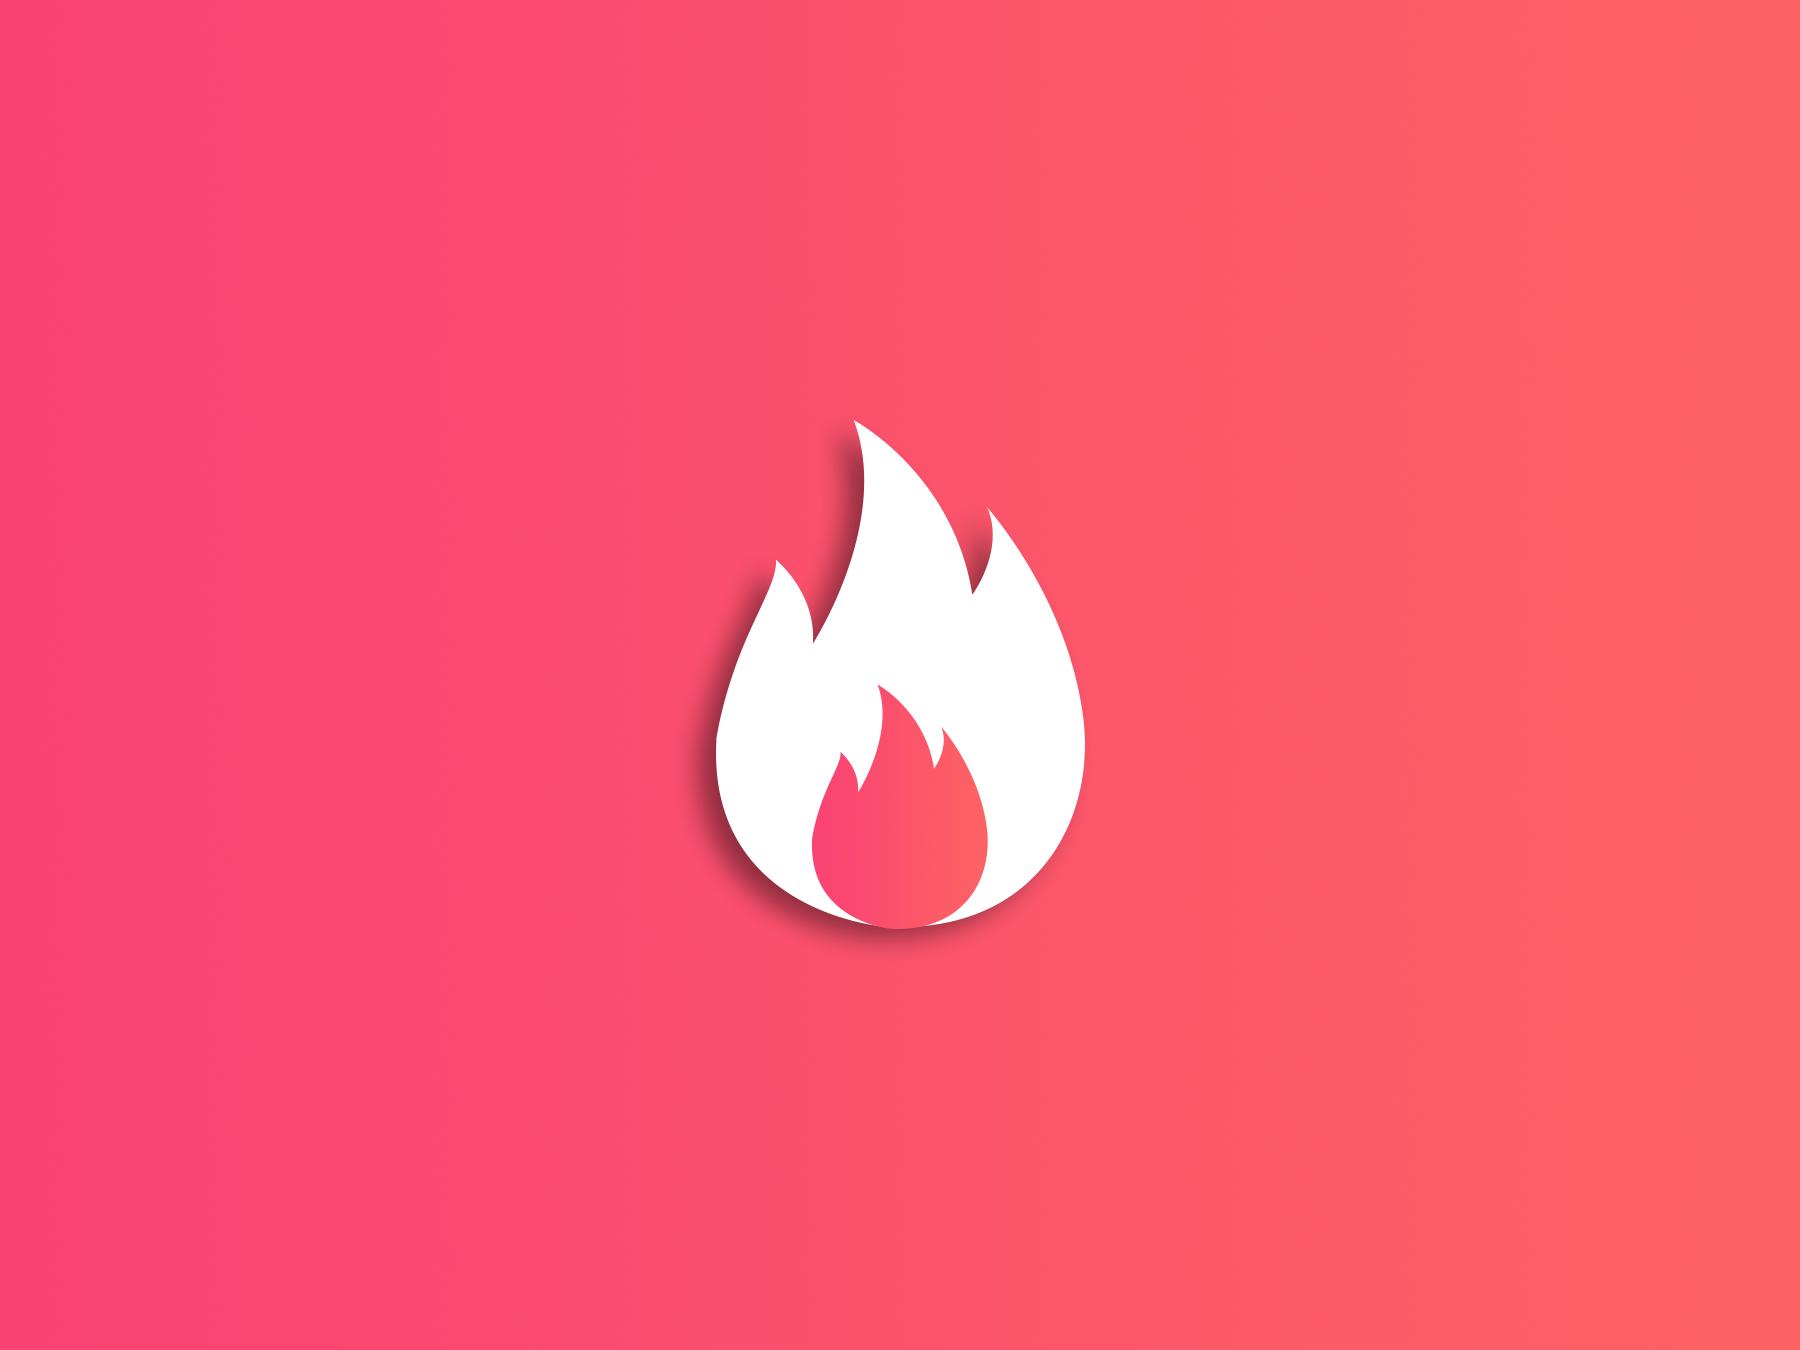 Logo, App, icon, Appicon, Symbol, Shape, Android, Tinder